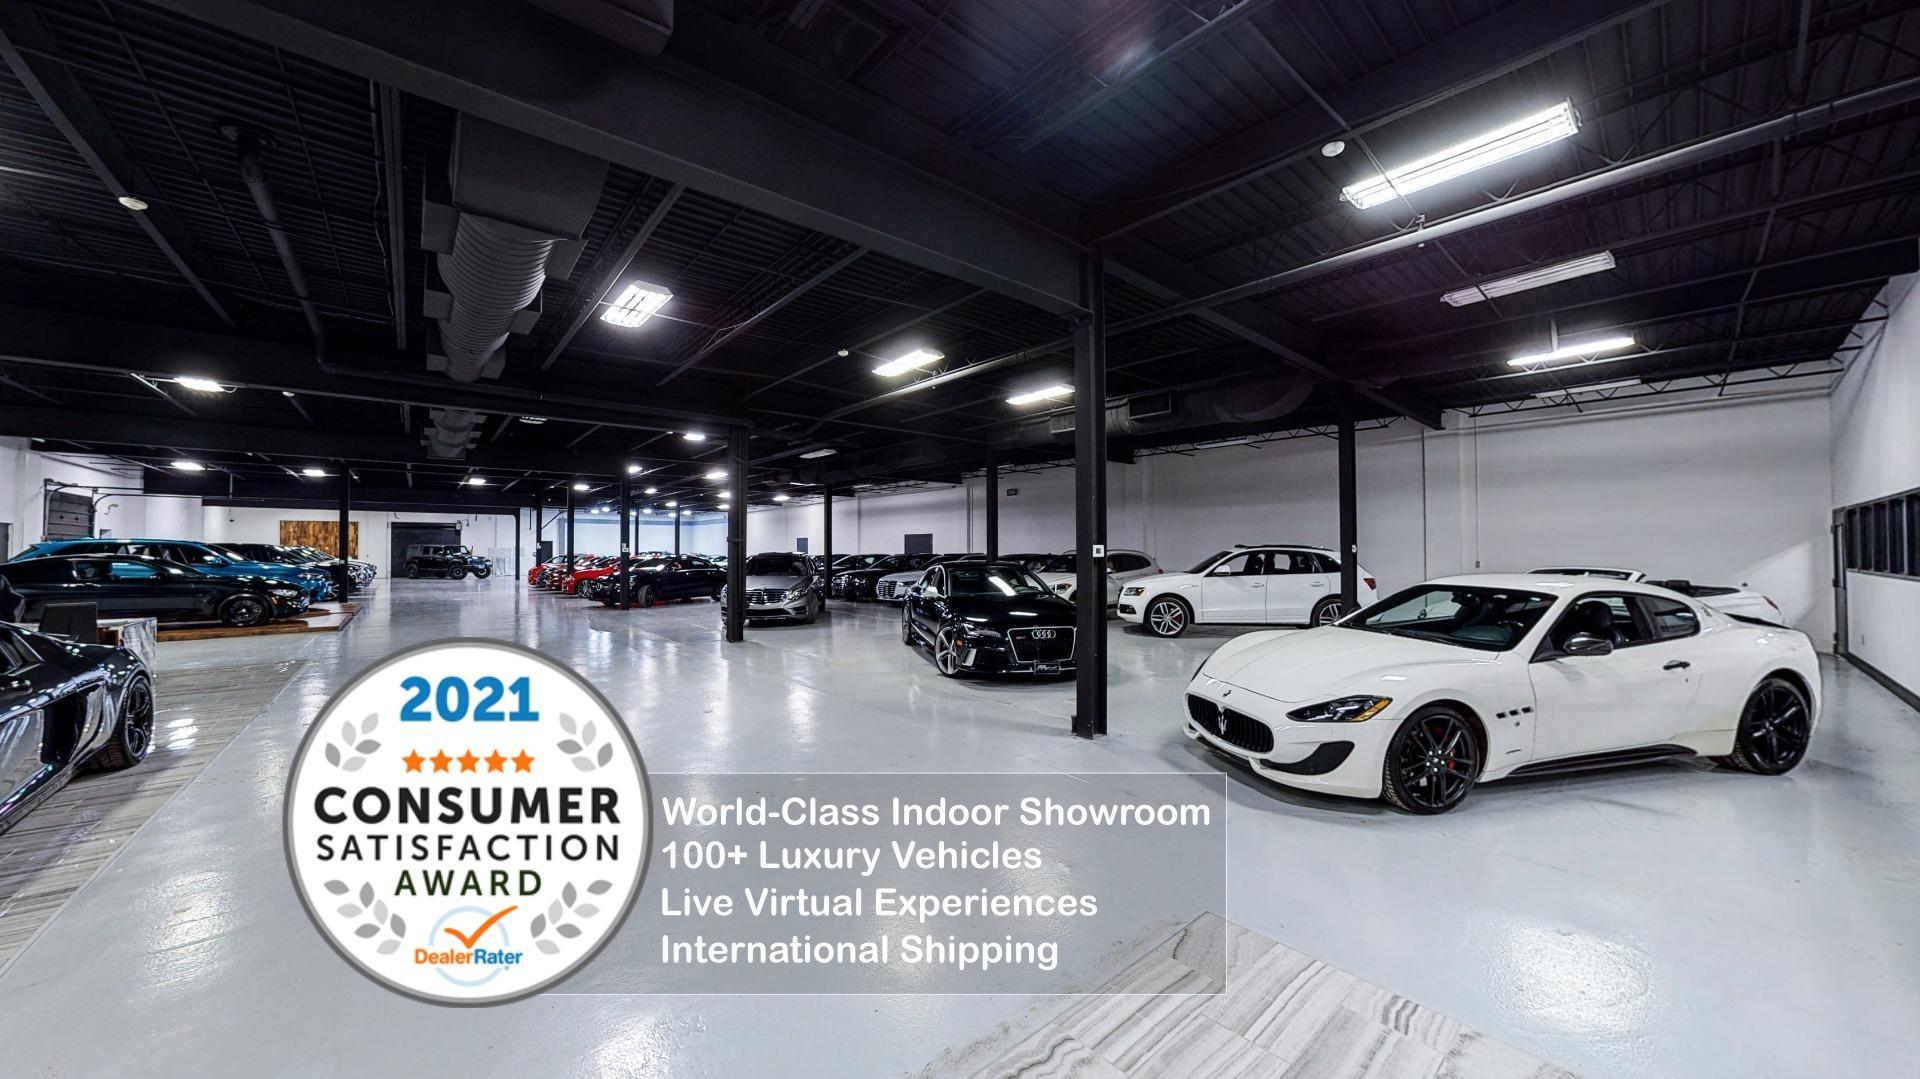 Used 2018 Audi Q5 2.0T quattro Premium Plus for sale $30,995 at Perfect Auto Collection in Akron OH 44310 3